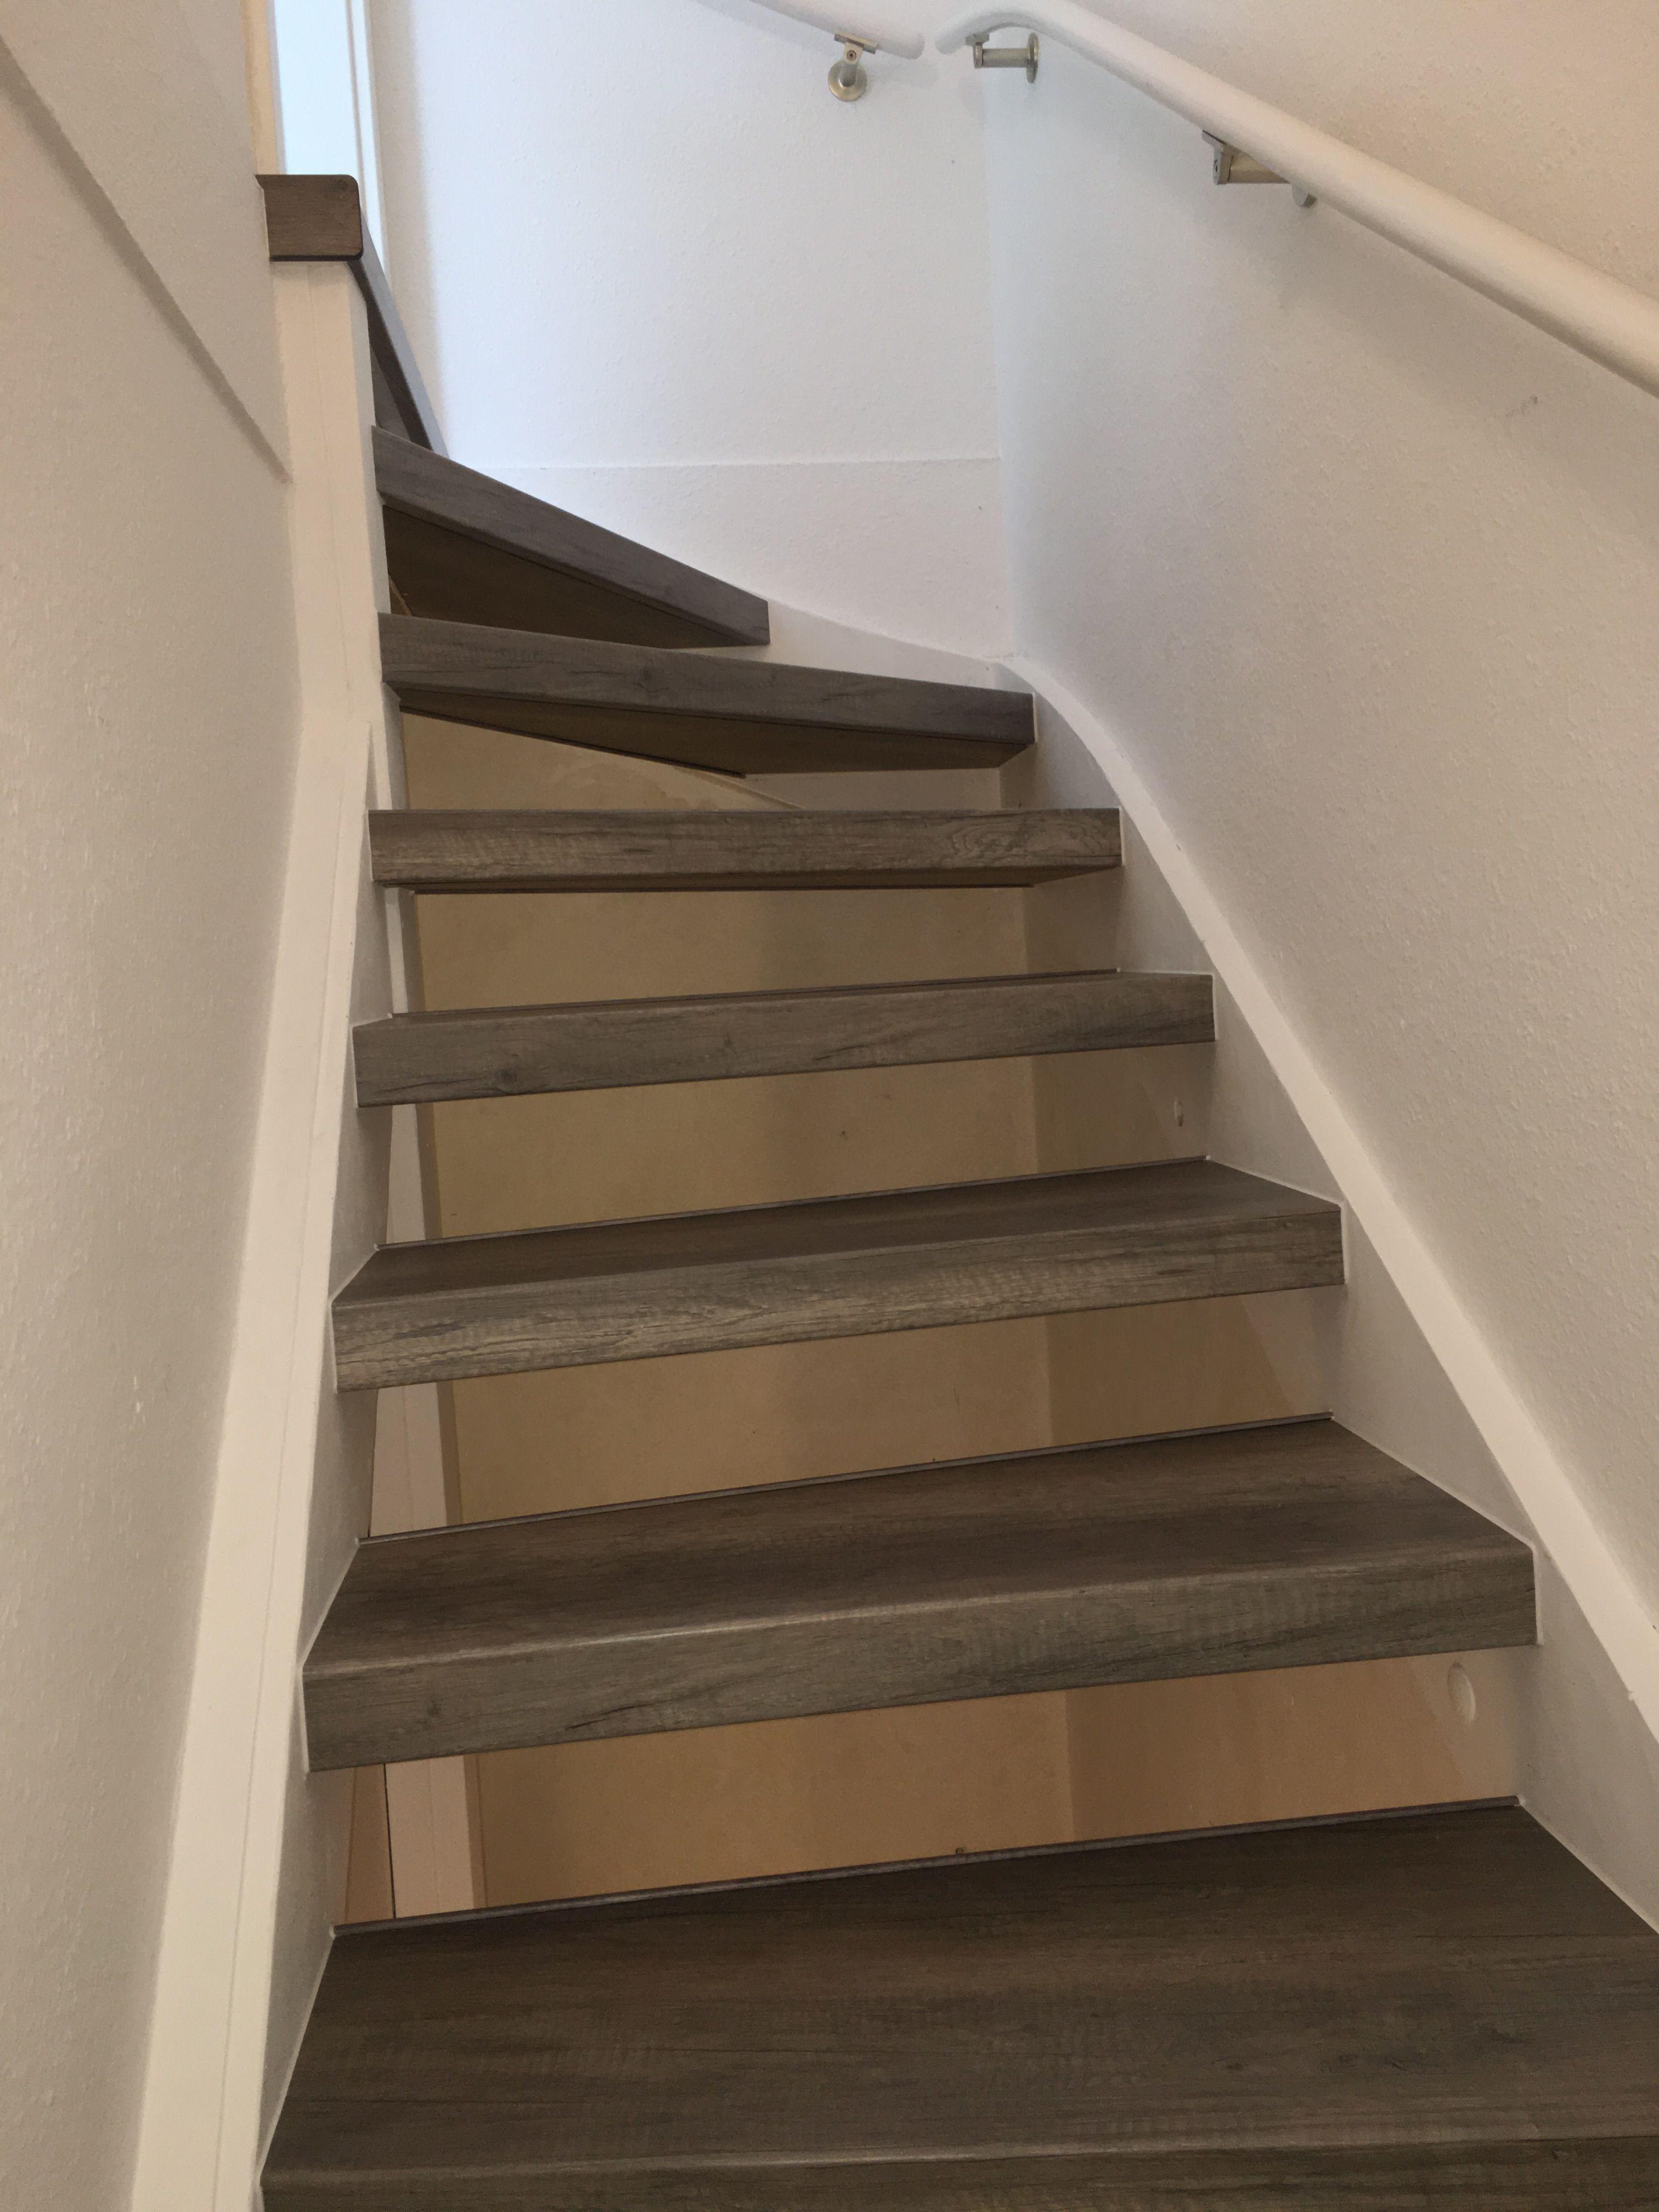 Offene Treppen offene treppen neu gestalten alte treppe neu gestalten